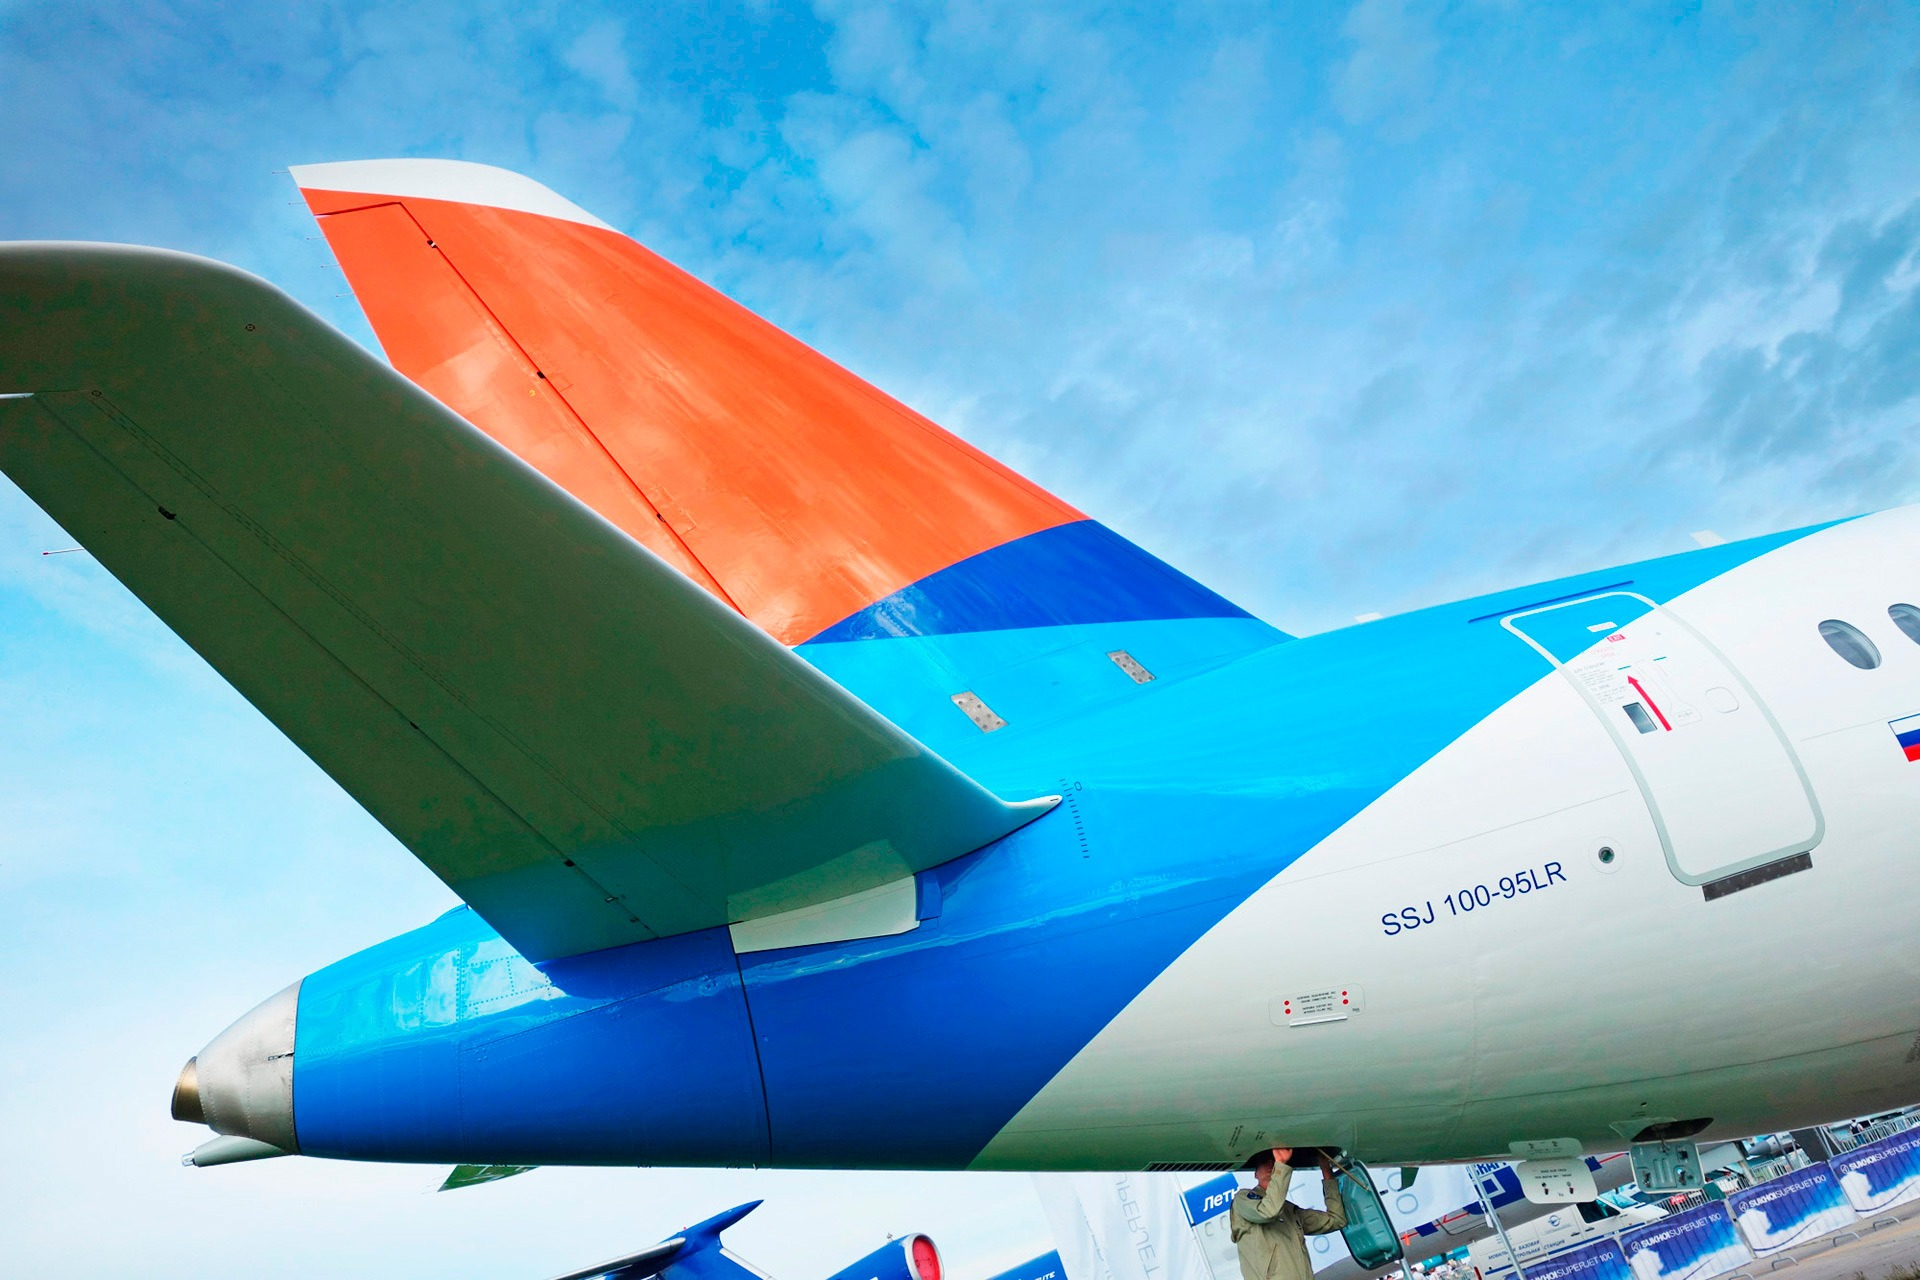 SSJ-100, брендинг авиакомпании Азимут, livery design for Azimuth Airline